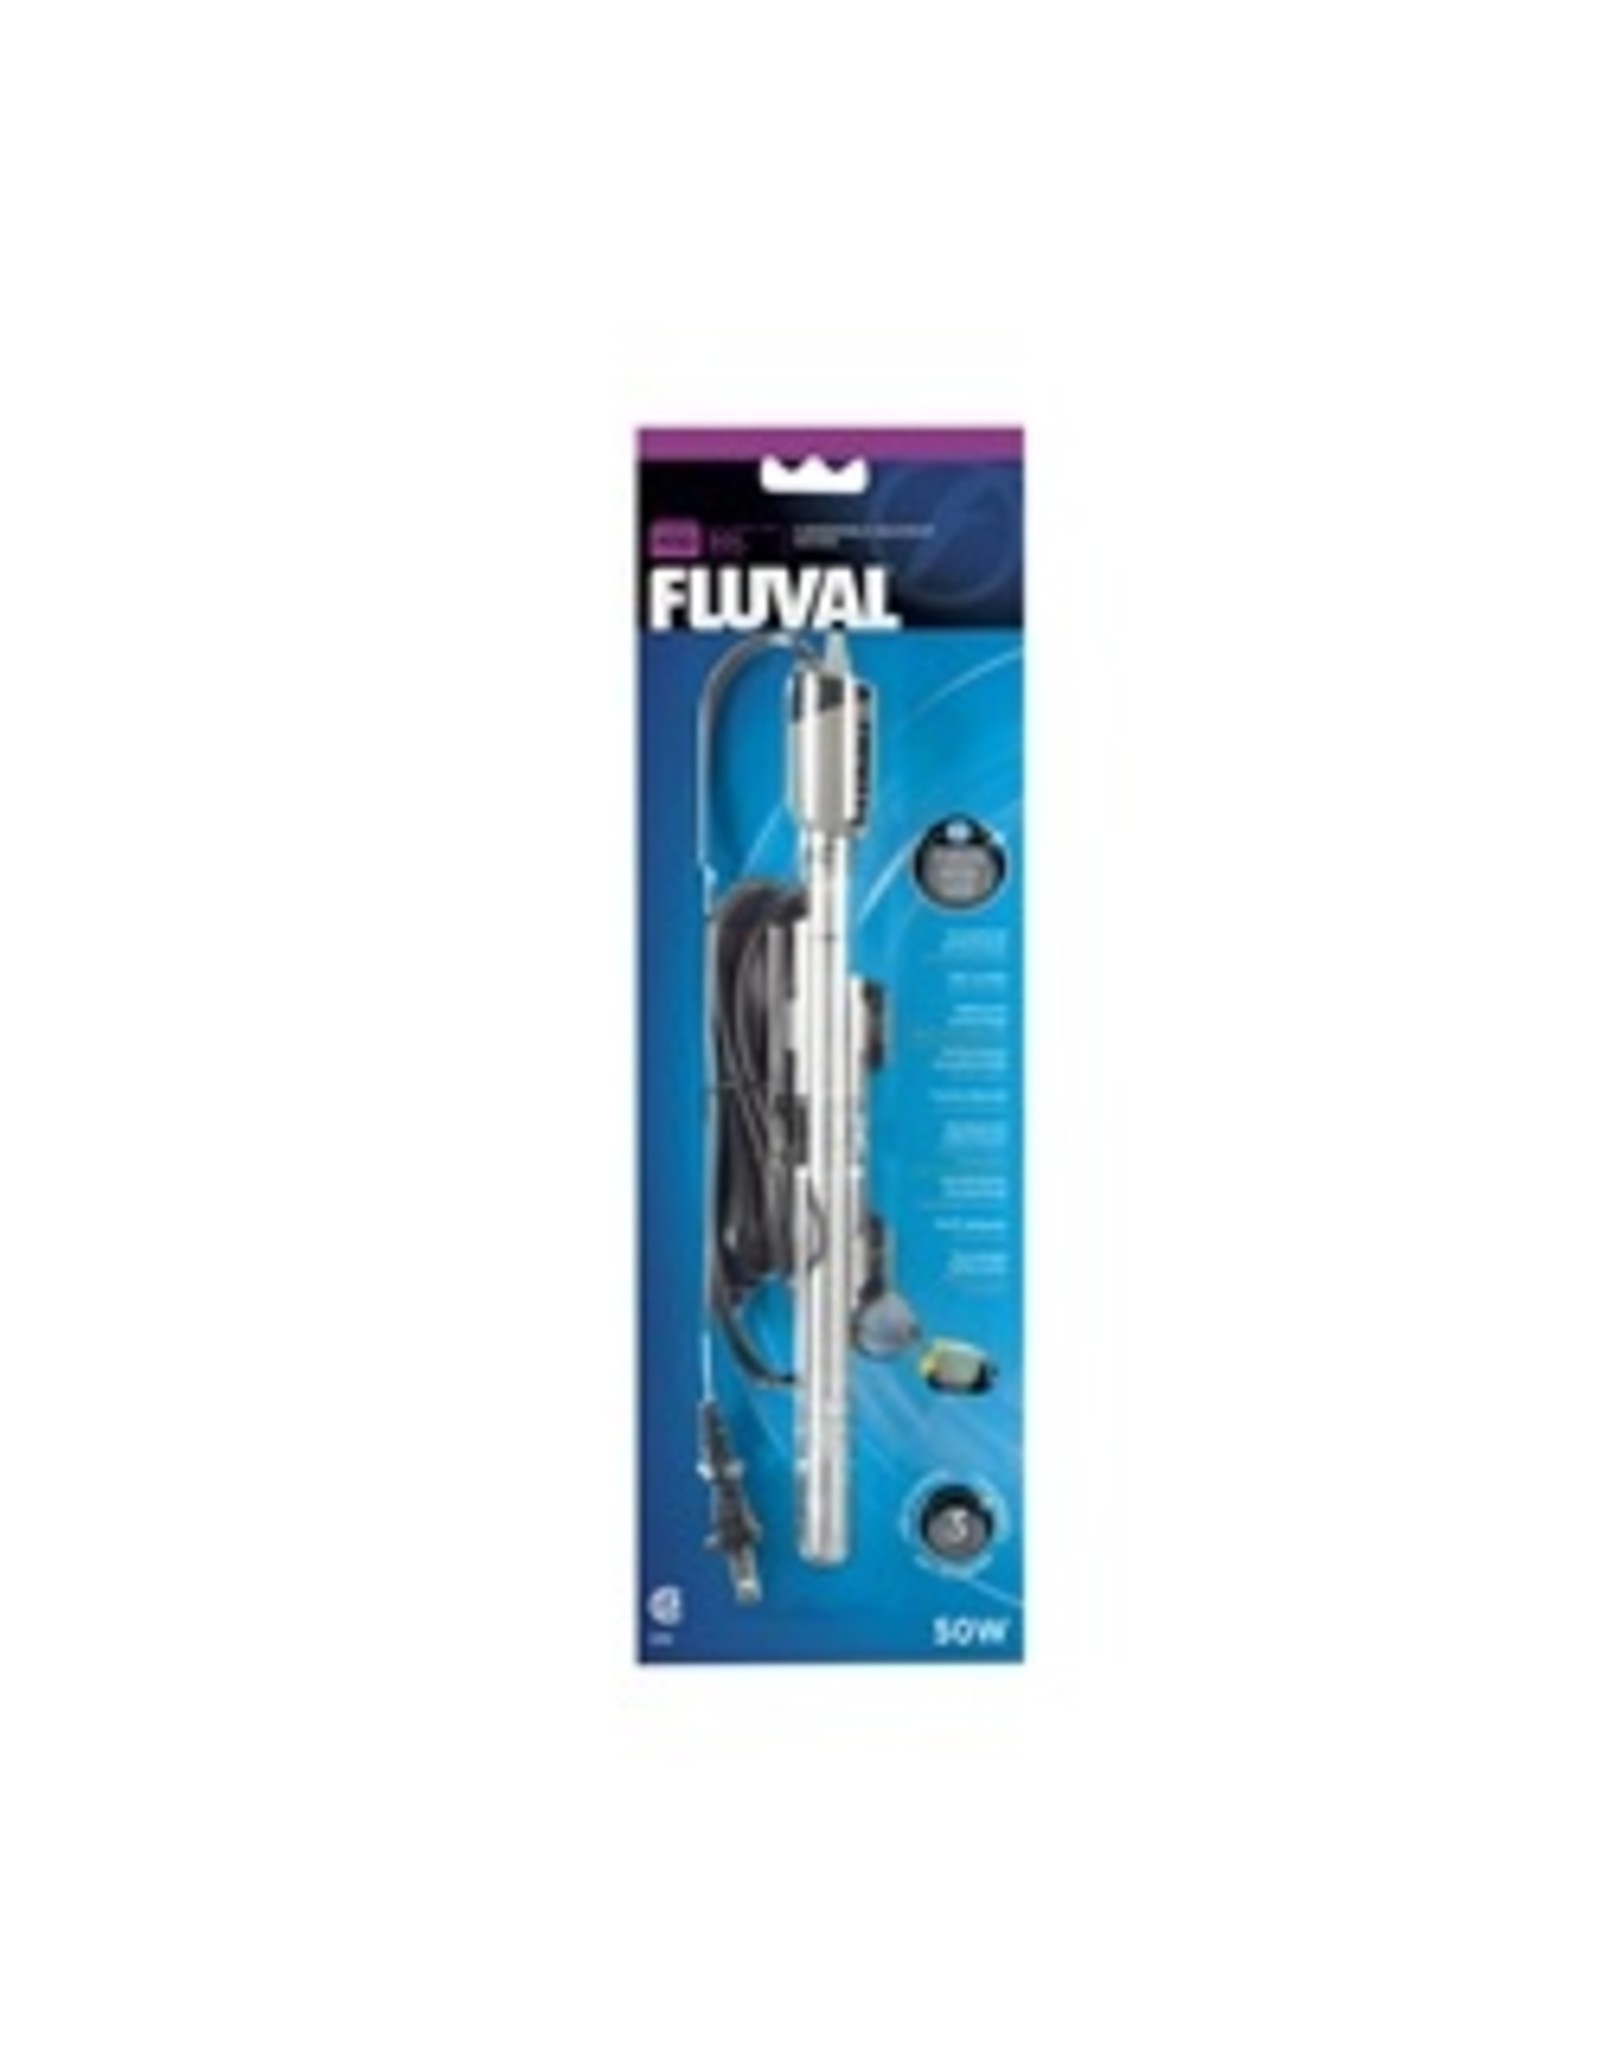 FL - Fluval Fluval M50 Submersible Heater 15GAL 50W